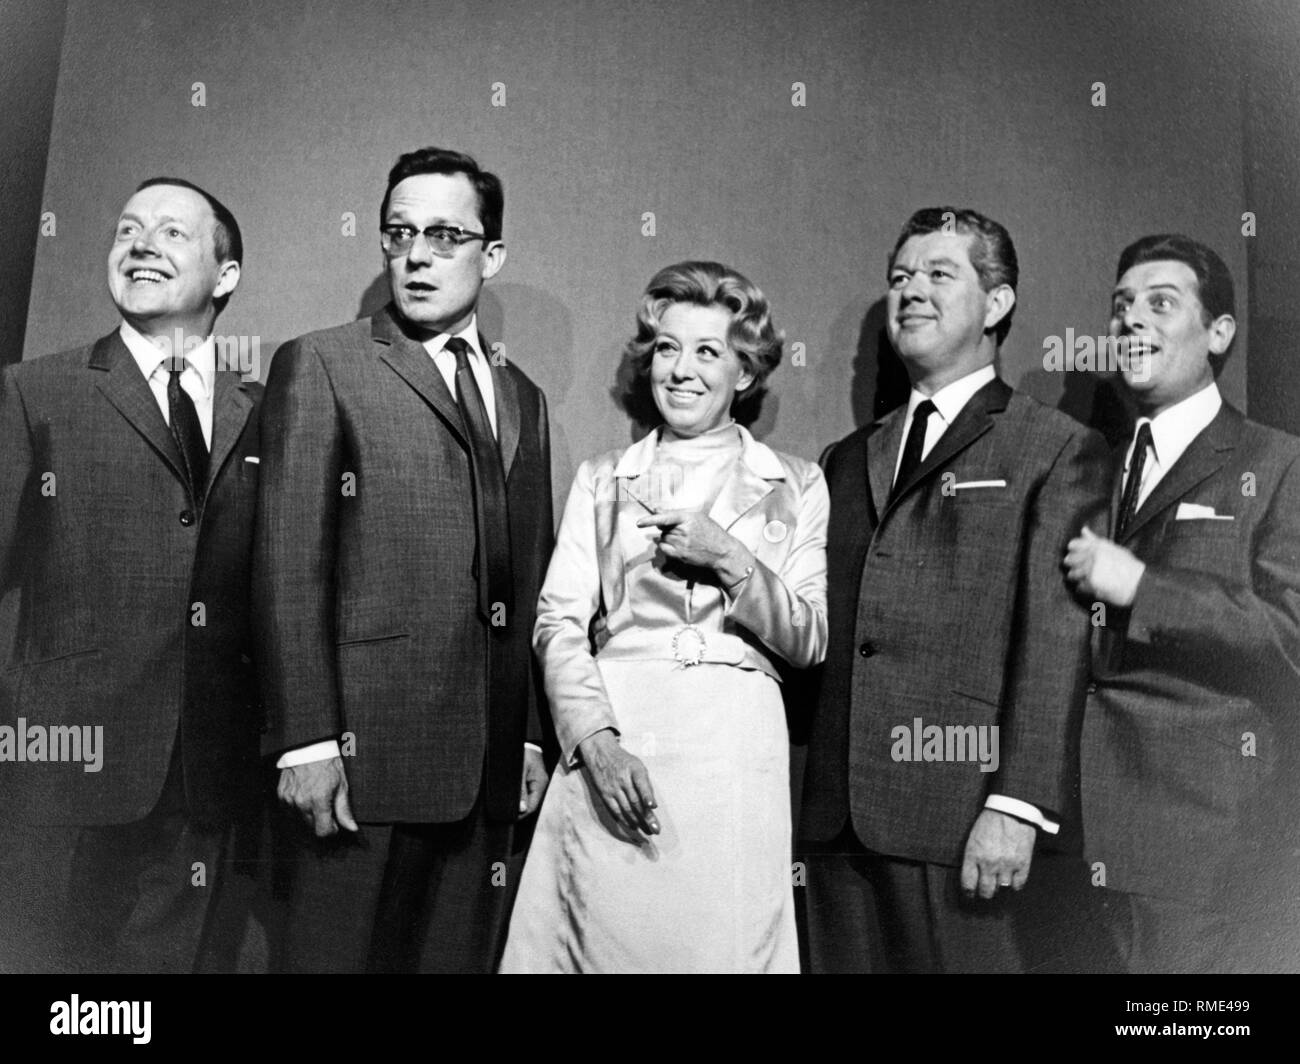 Sketch of the Muenchner Lach- und Schiessgesellschaft from the 1960s. In this set-up, the ensemble had five programs between 1965 and 1968, directed by Sammy Drechsel. From left to right: Hans Juergen Diedrich, Dieter Hildebrandt, Ursula Noack, Klaus Havenstein and Juergen Scheller. - Stock Image